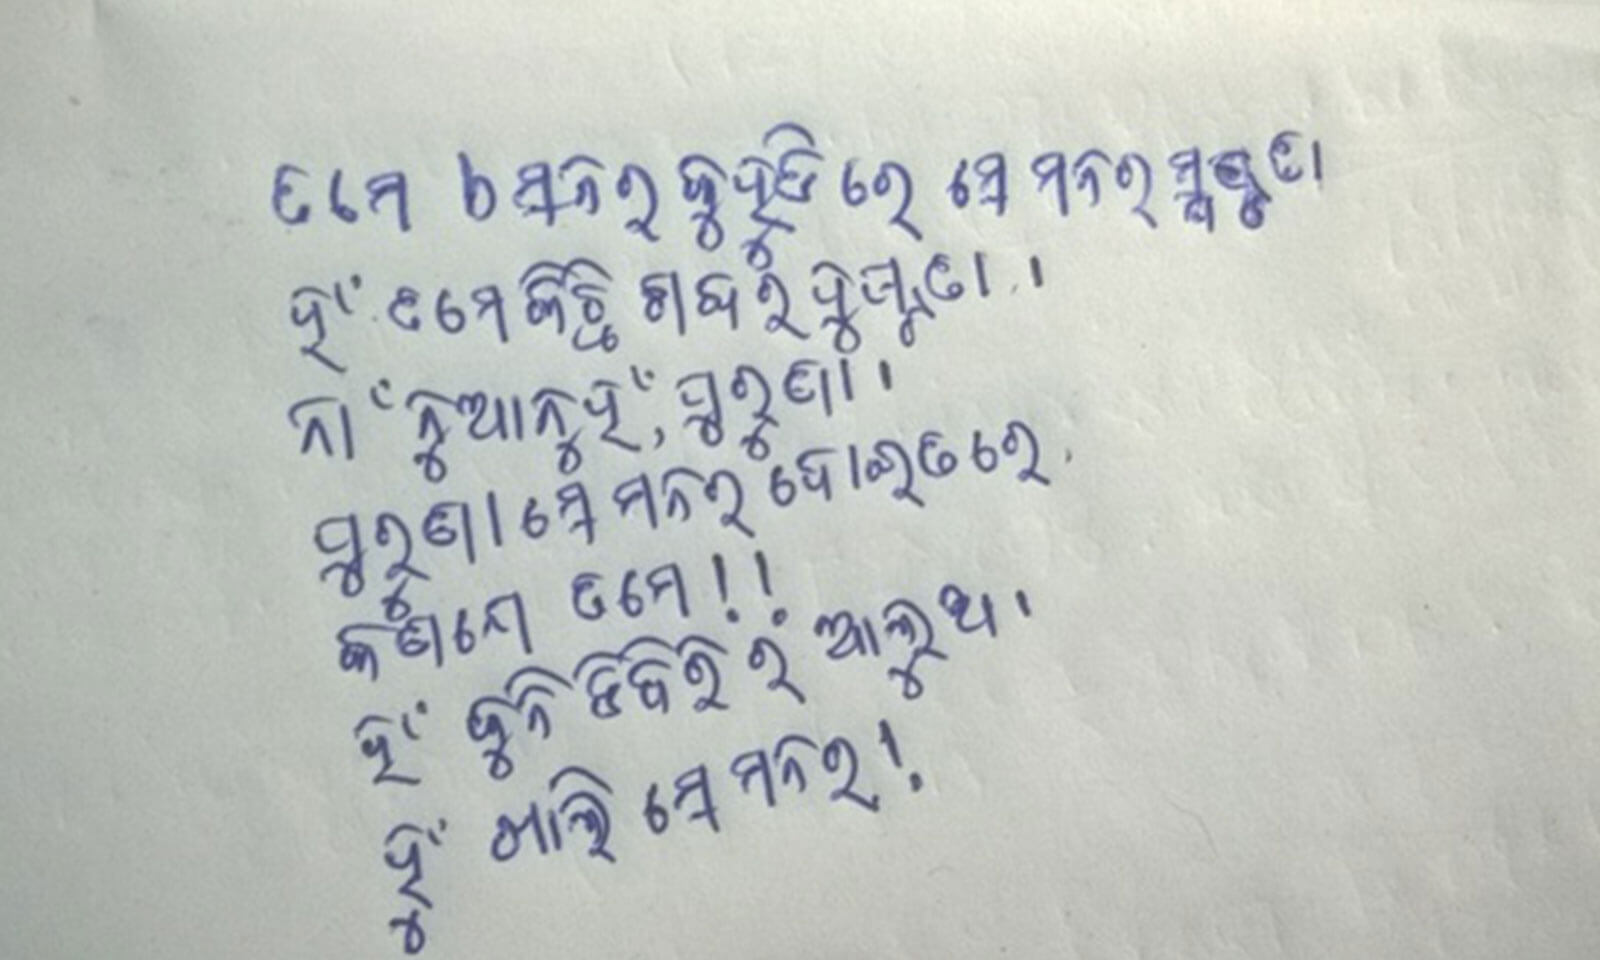 Minati Pradhan's odia poem Raph Khataa